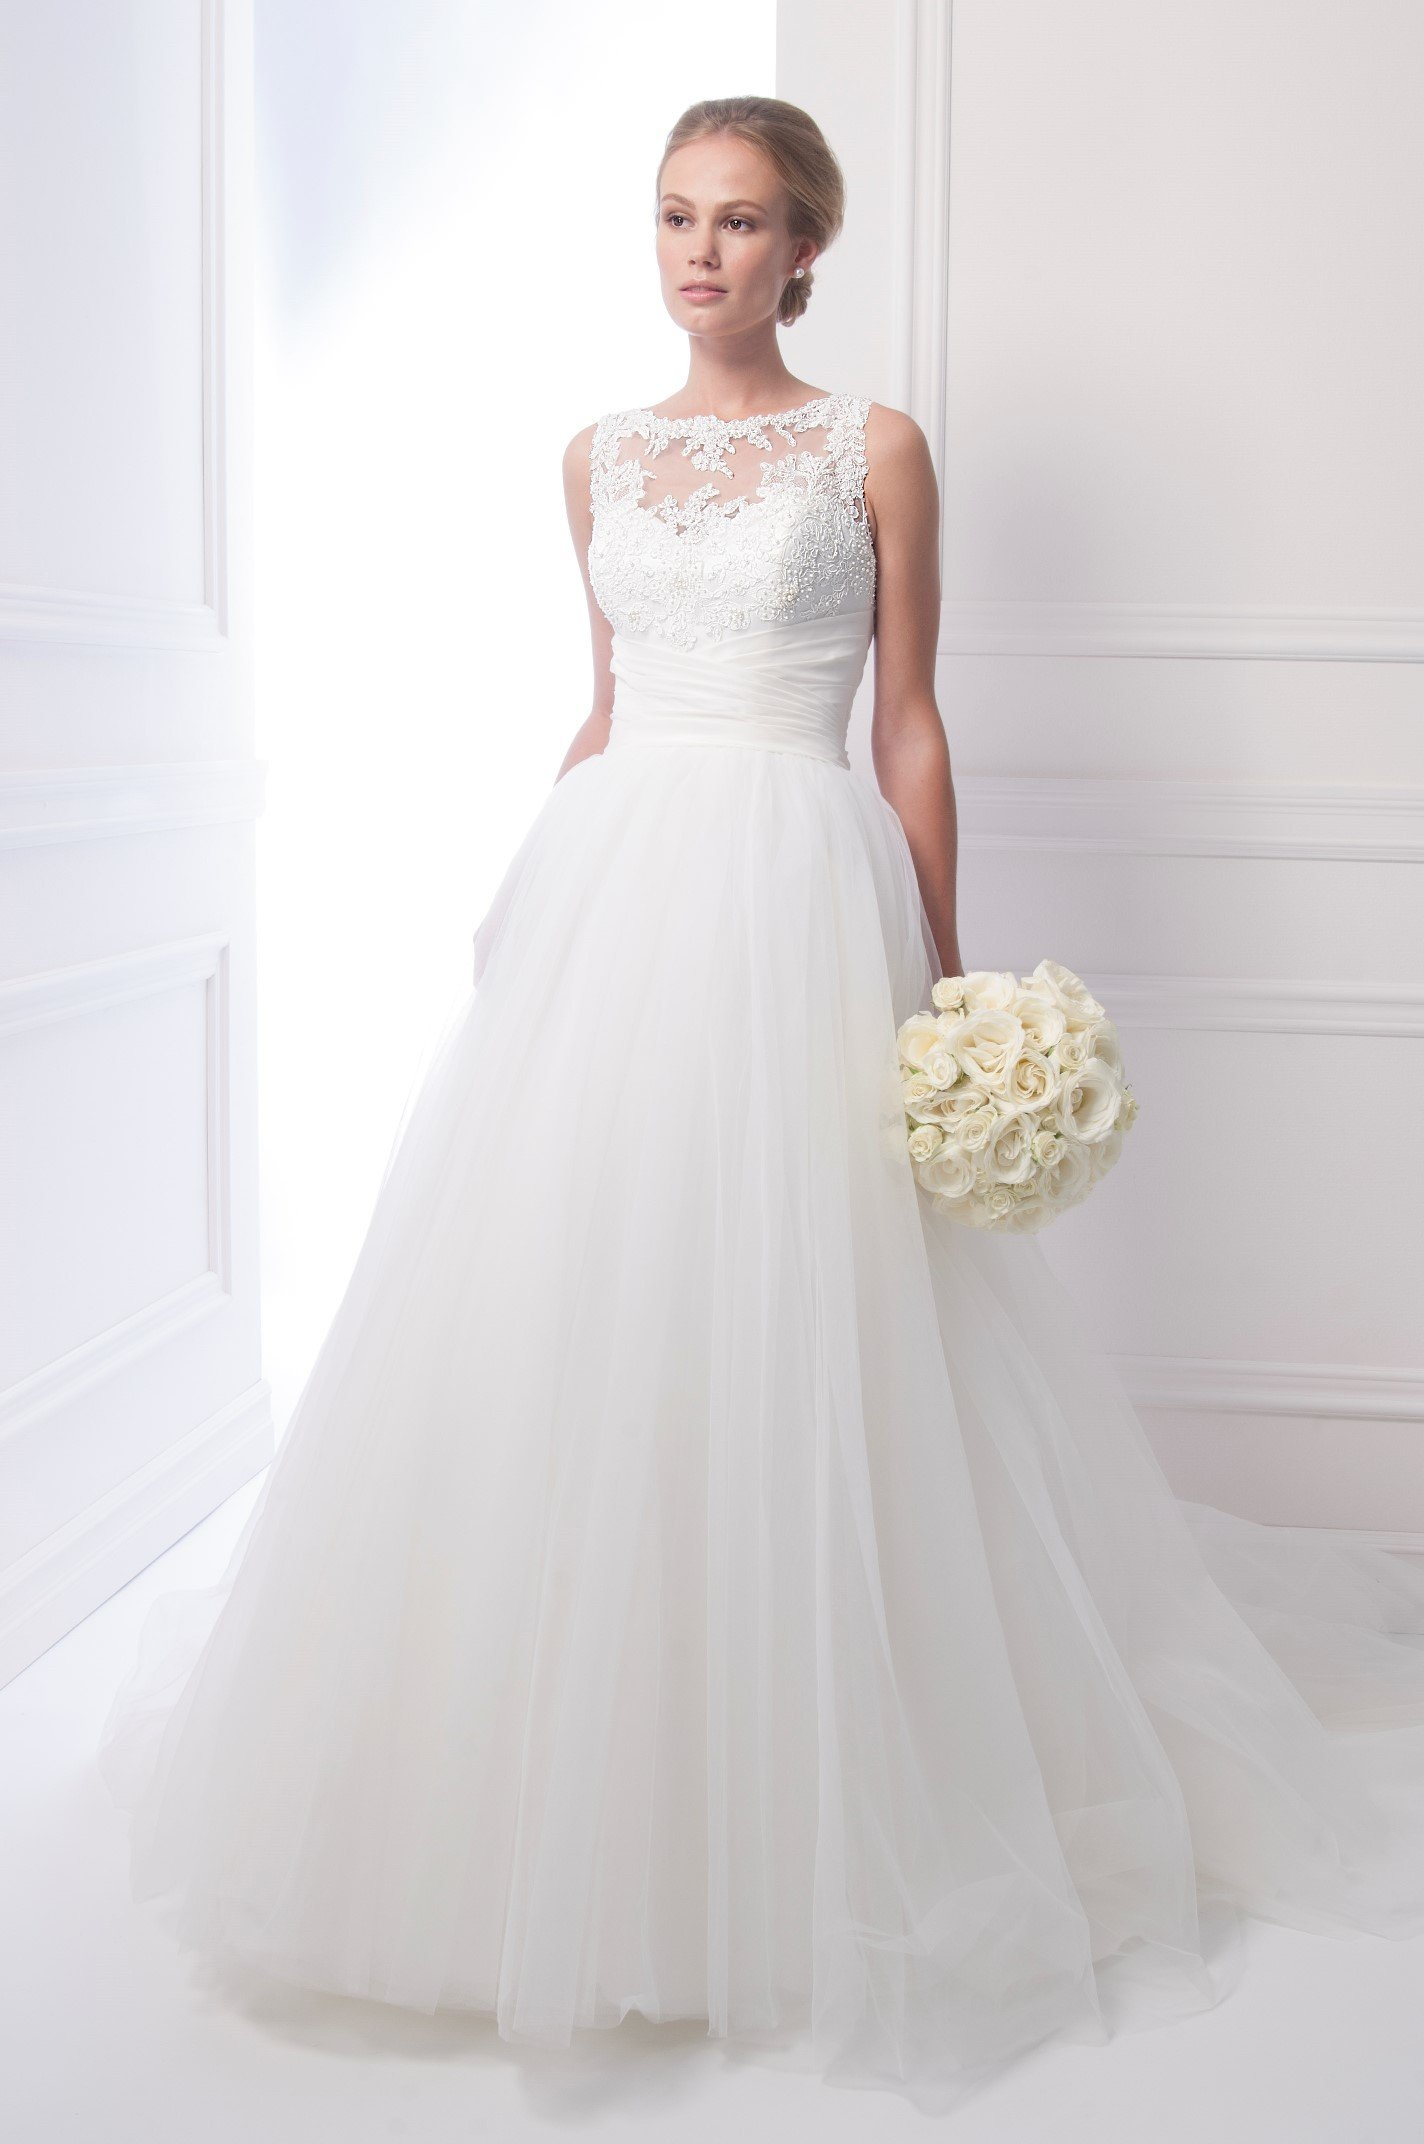 Dress alfred sung spring 2014 bridal 6940 alfredsung bridal alfred sung spring 2014 bridal 6940 ombrellifo Choice Image